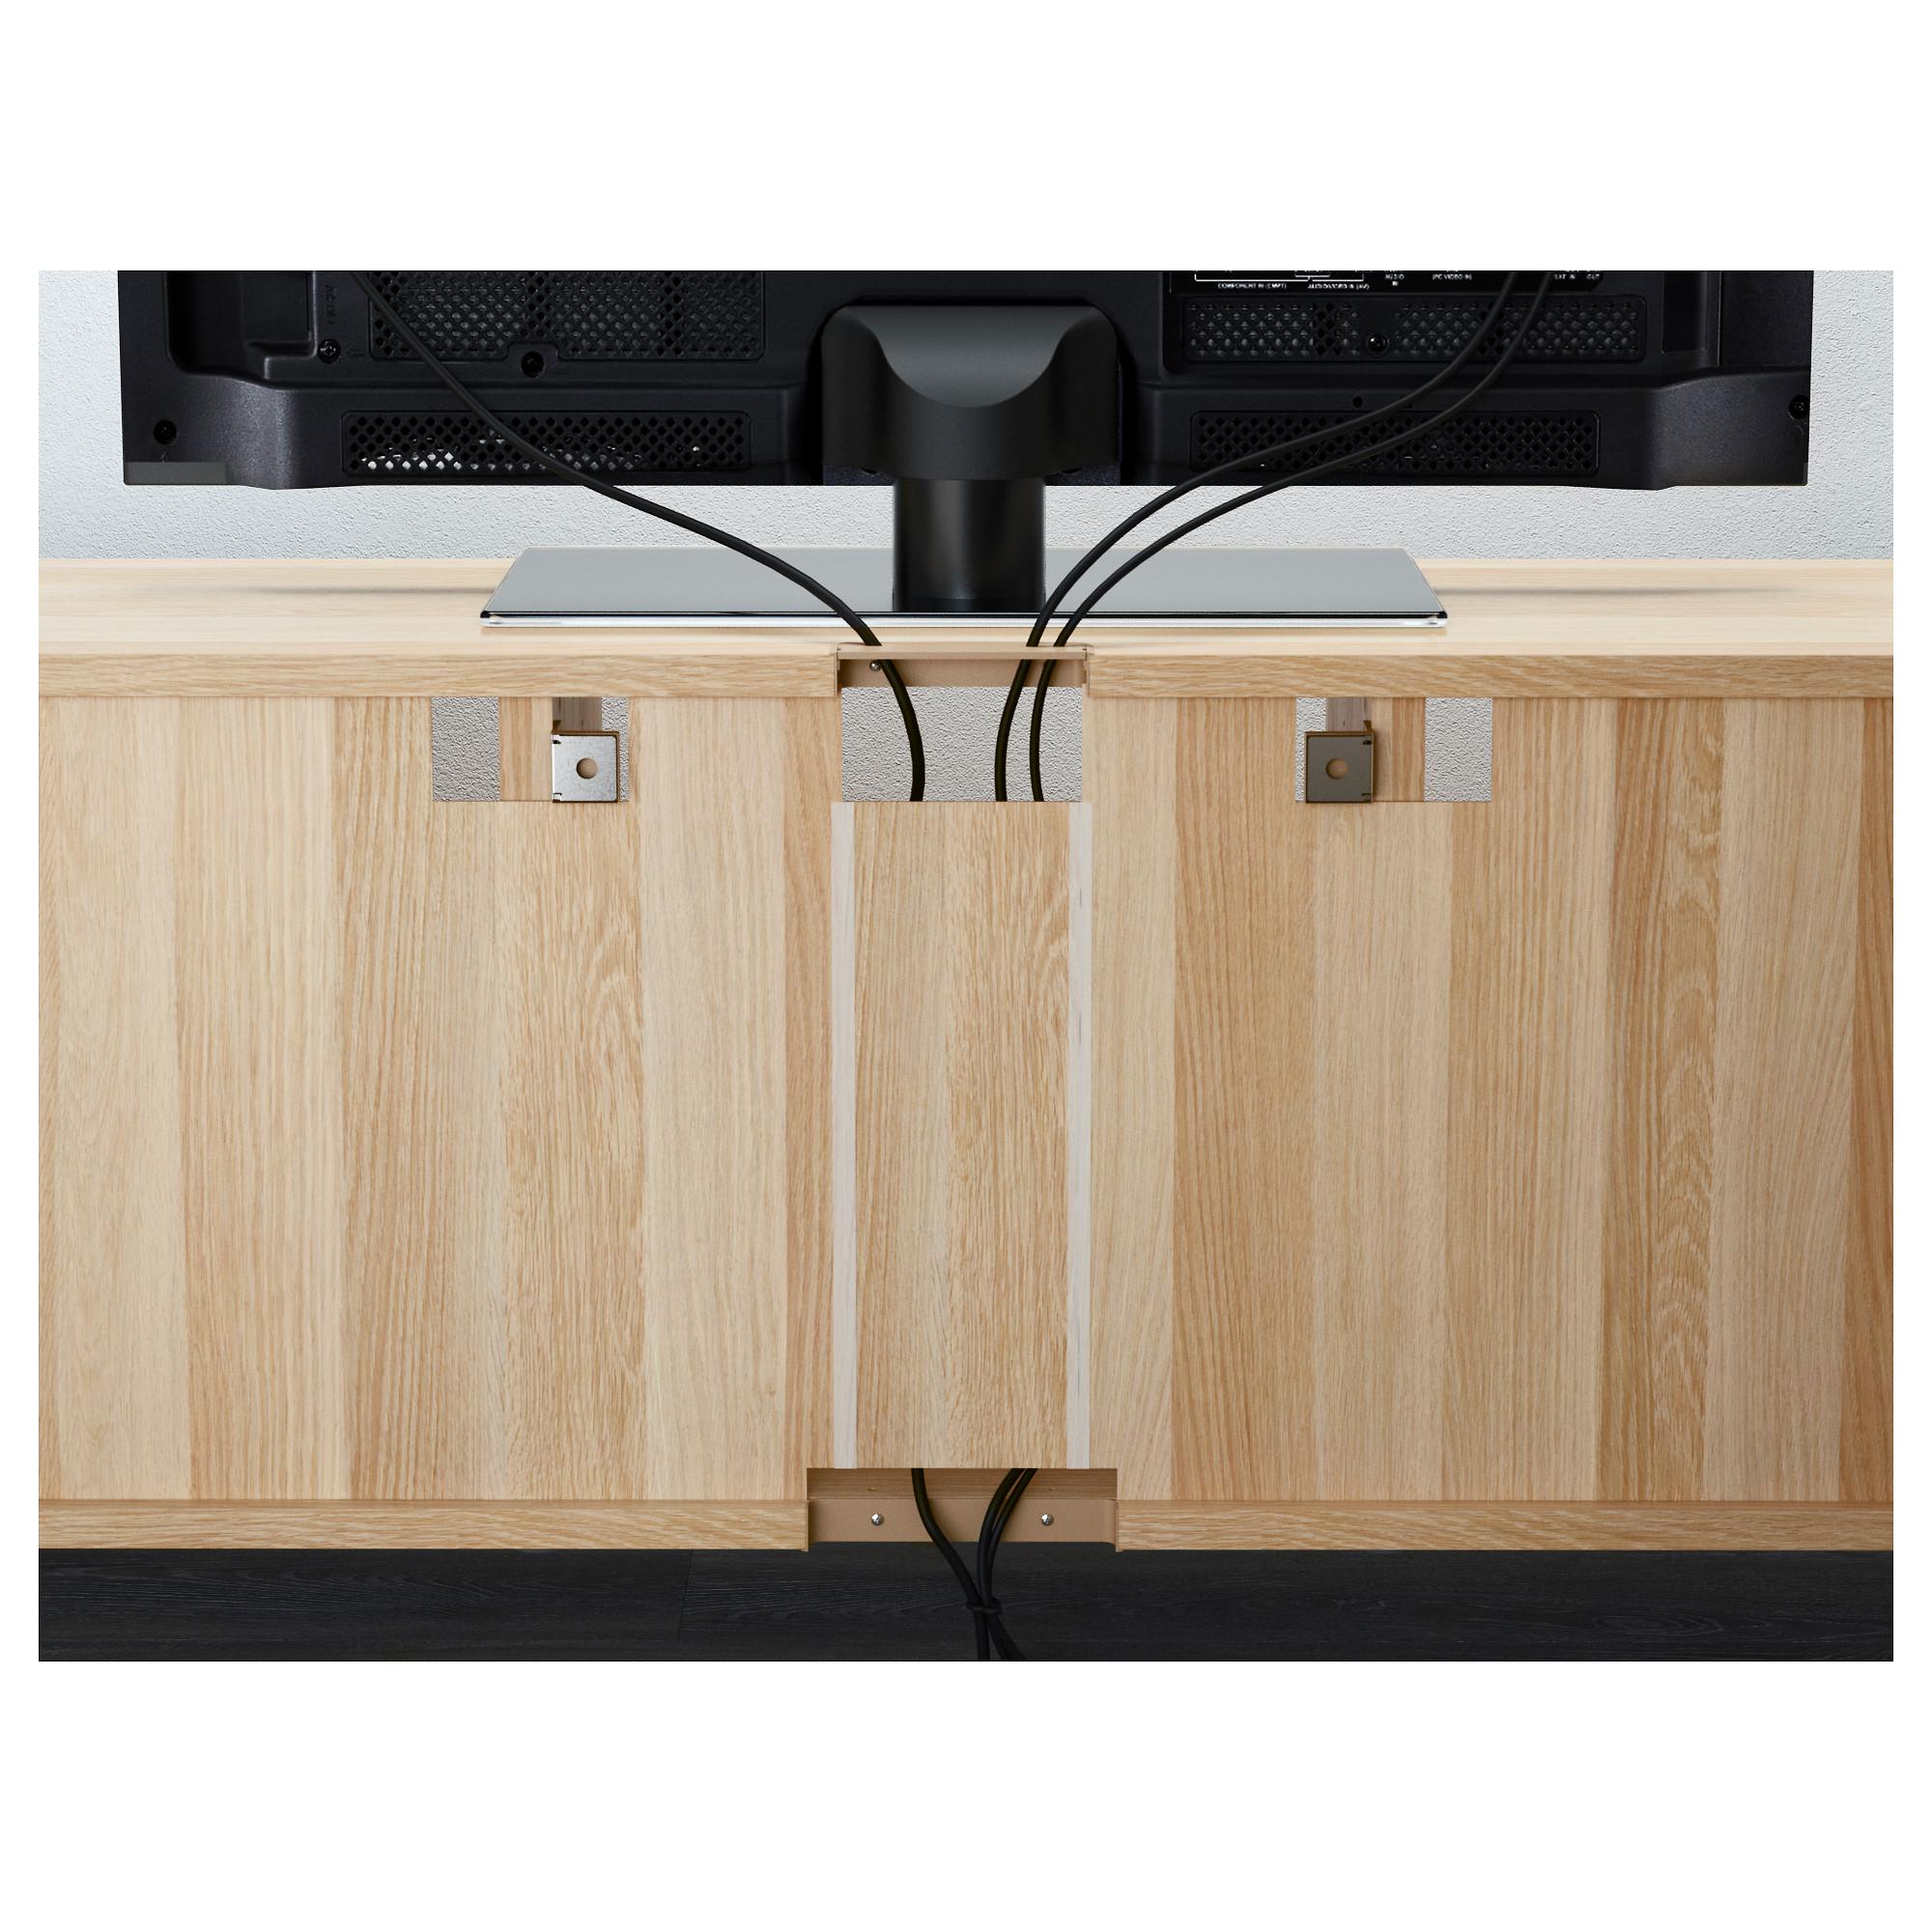 Тумба под ТВ БЕСТО артикуль № 092.758.82 в наличии. Интернет сайт IKEA РБ. Недорогая доставка и соборка.